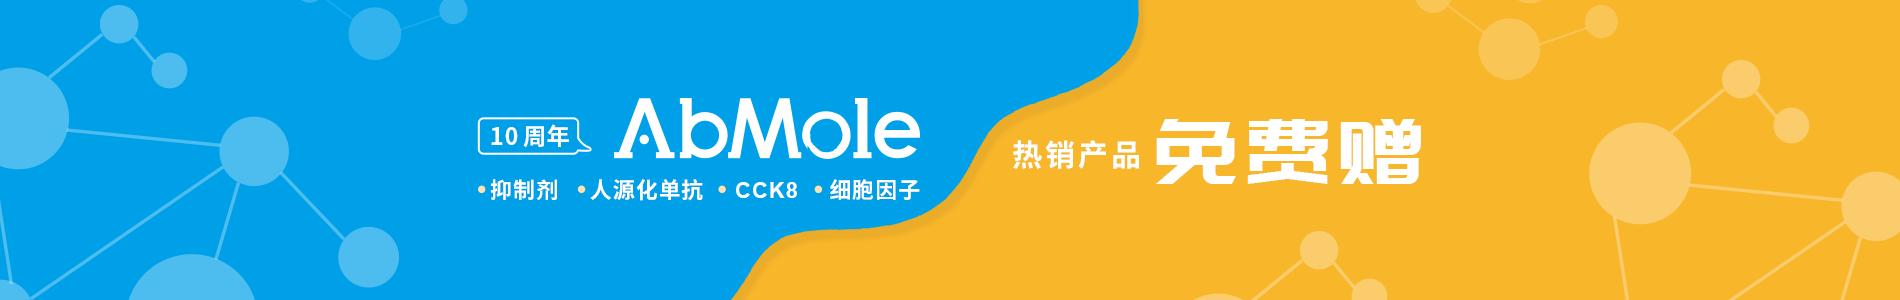 AbMole十周年回馈